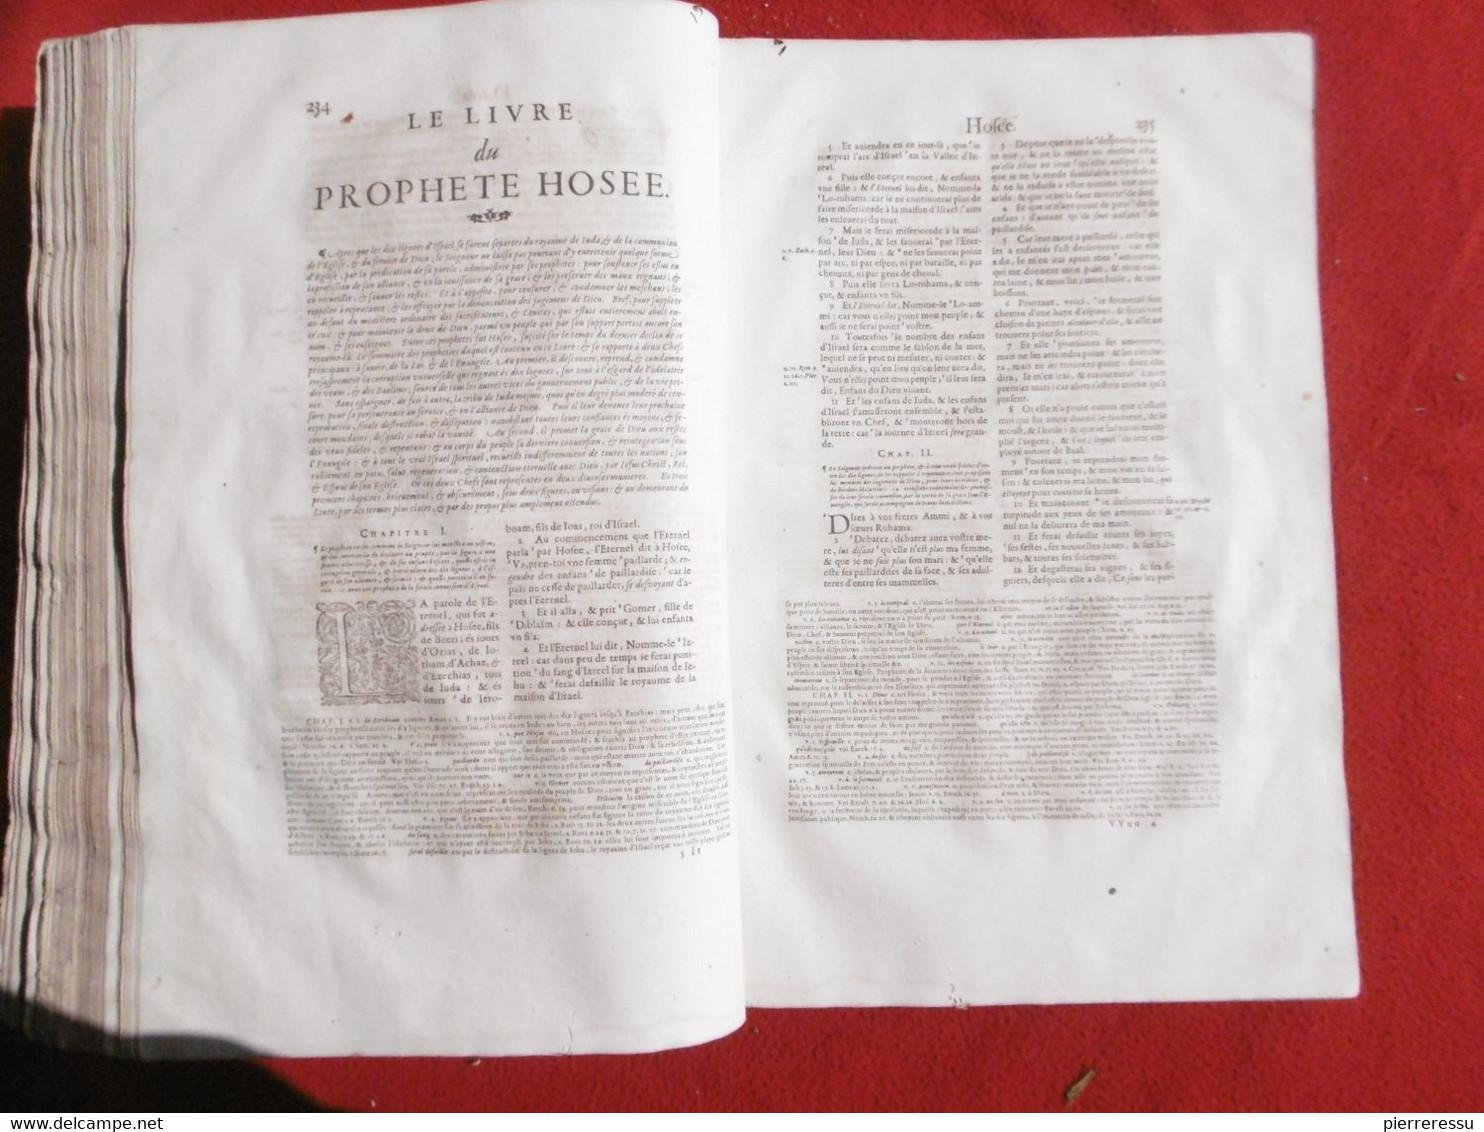 LA SAINTE BIBLE INTERPRETEE PAR JEAN DIODATI 1644 GENEVE PIERRE CHOUET RRRRRRRRRRRR - Christianismus